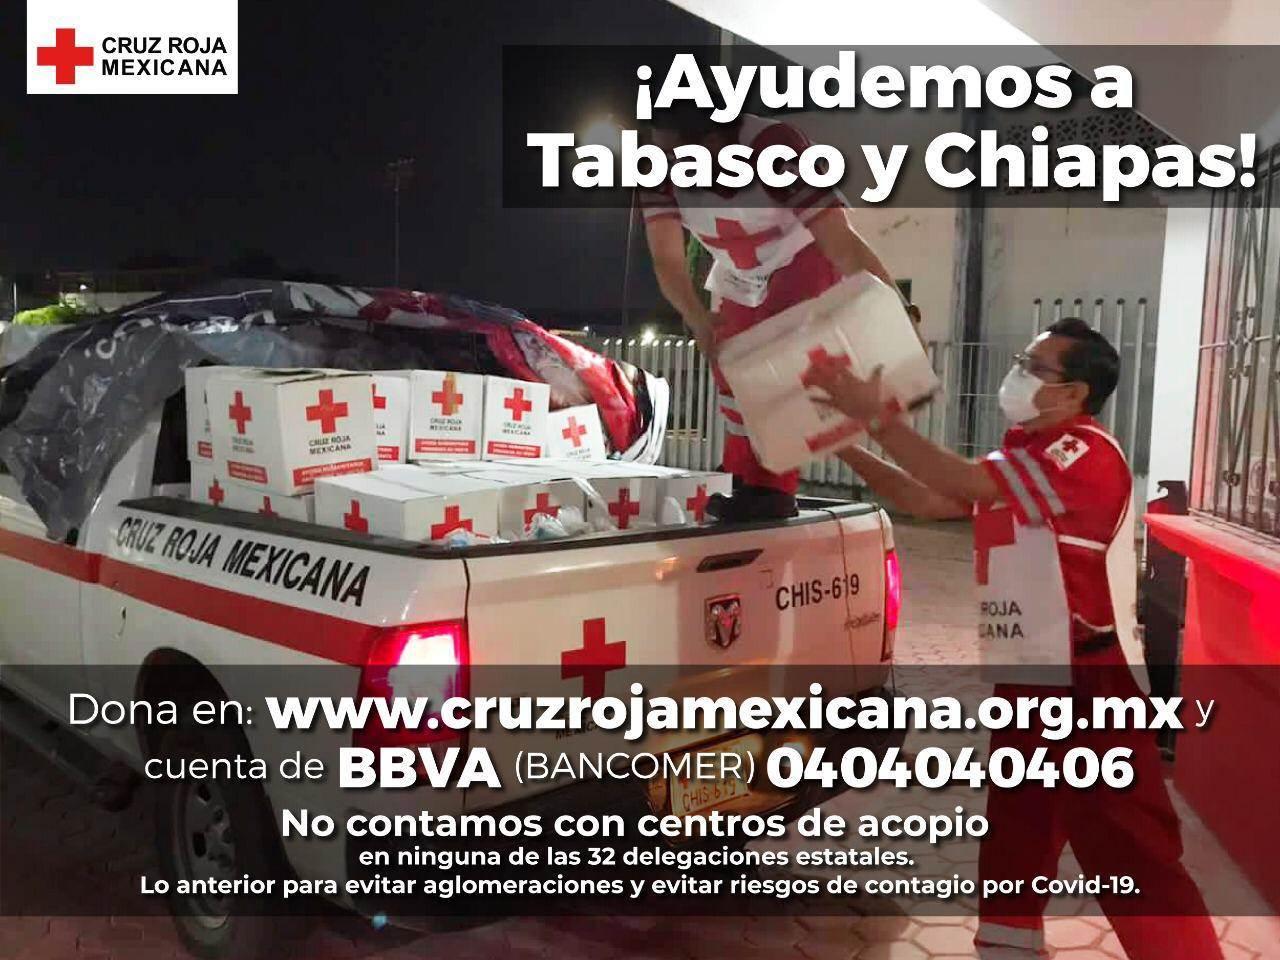 Dona en www.cruzrojamexicana.org.mx